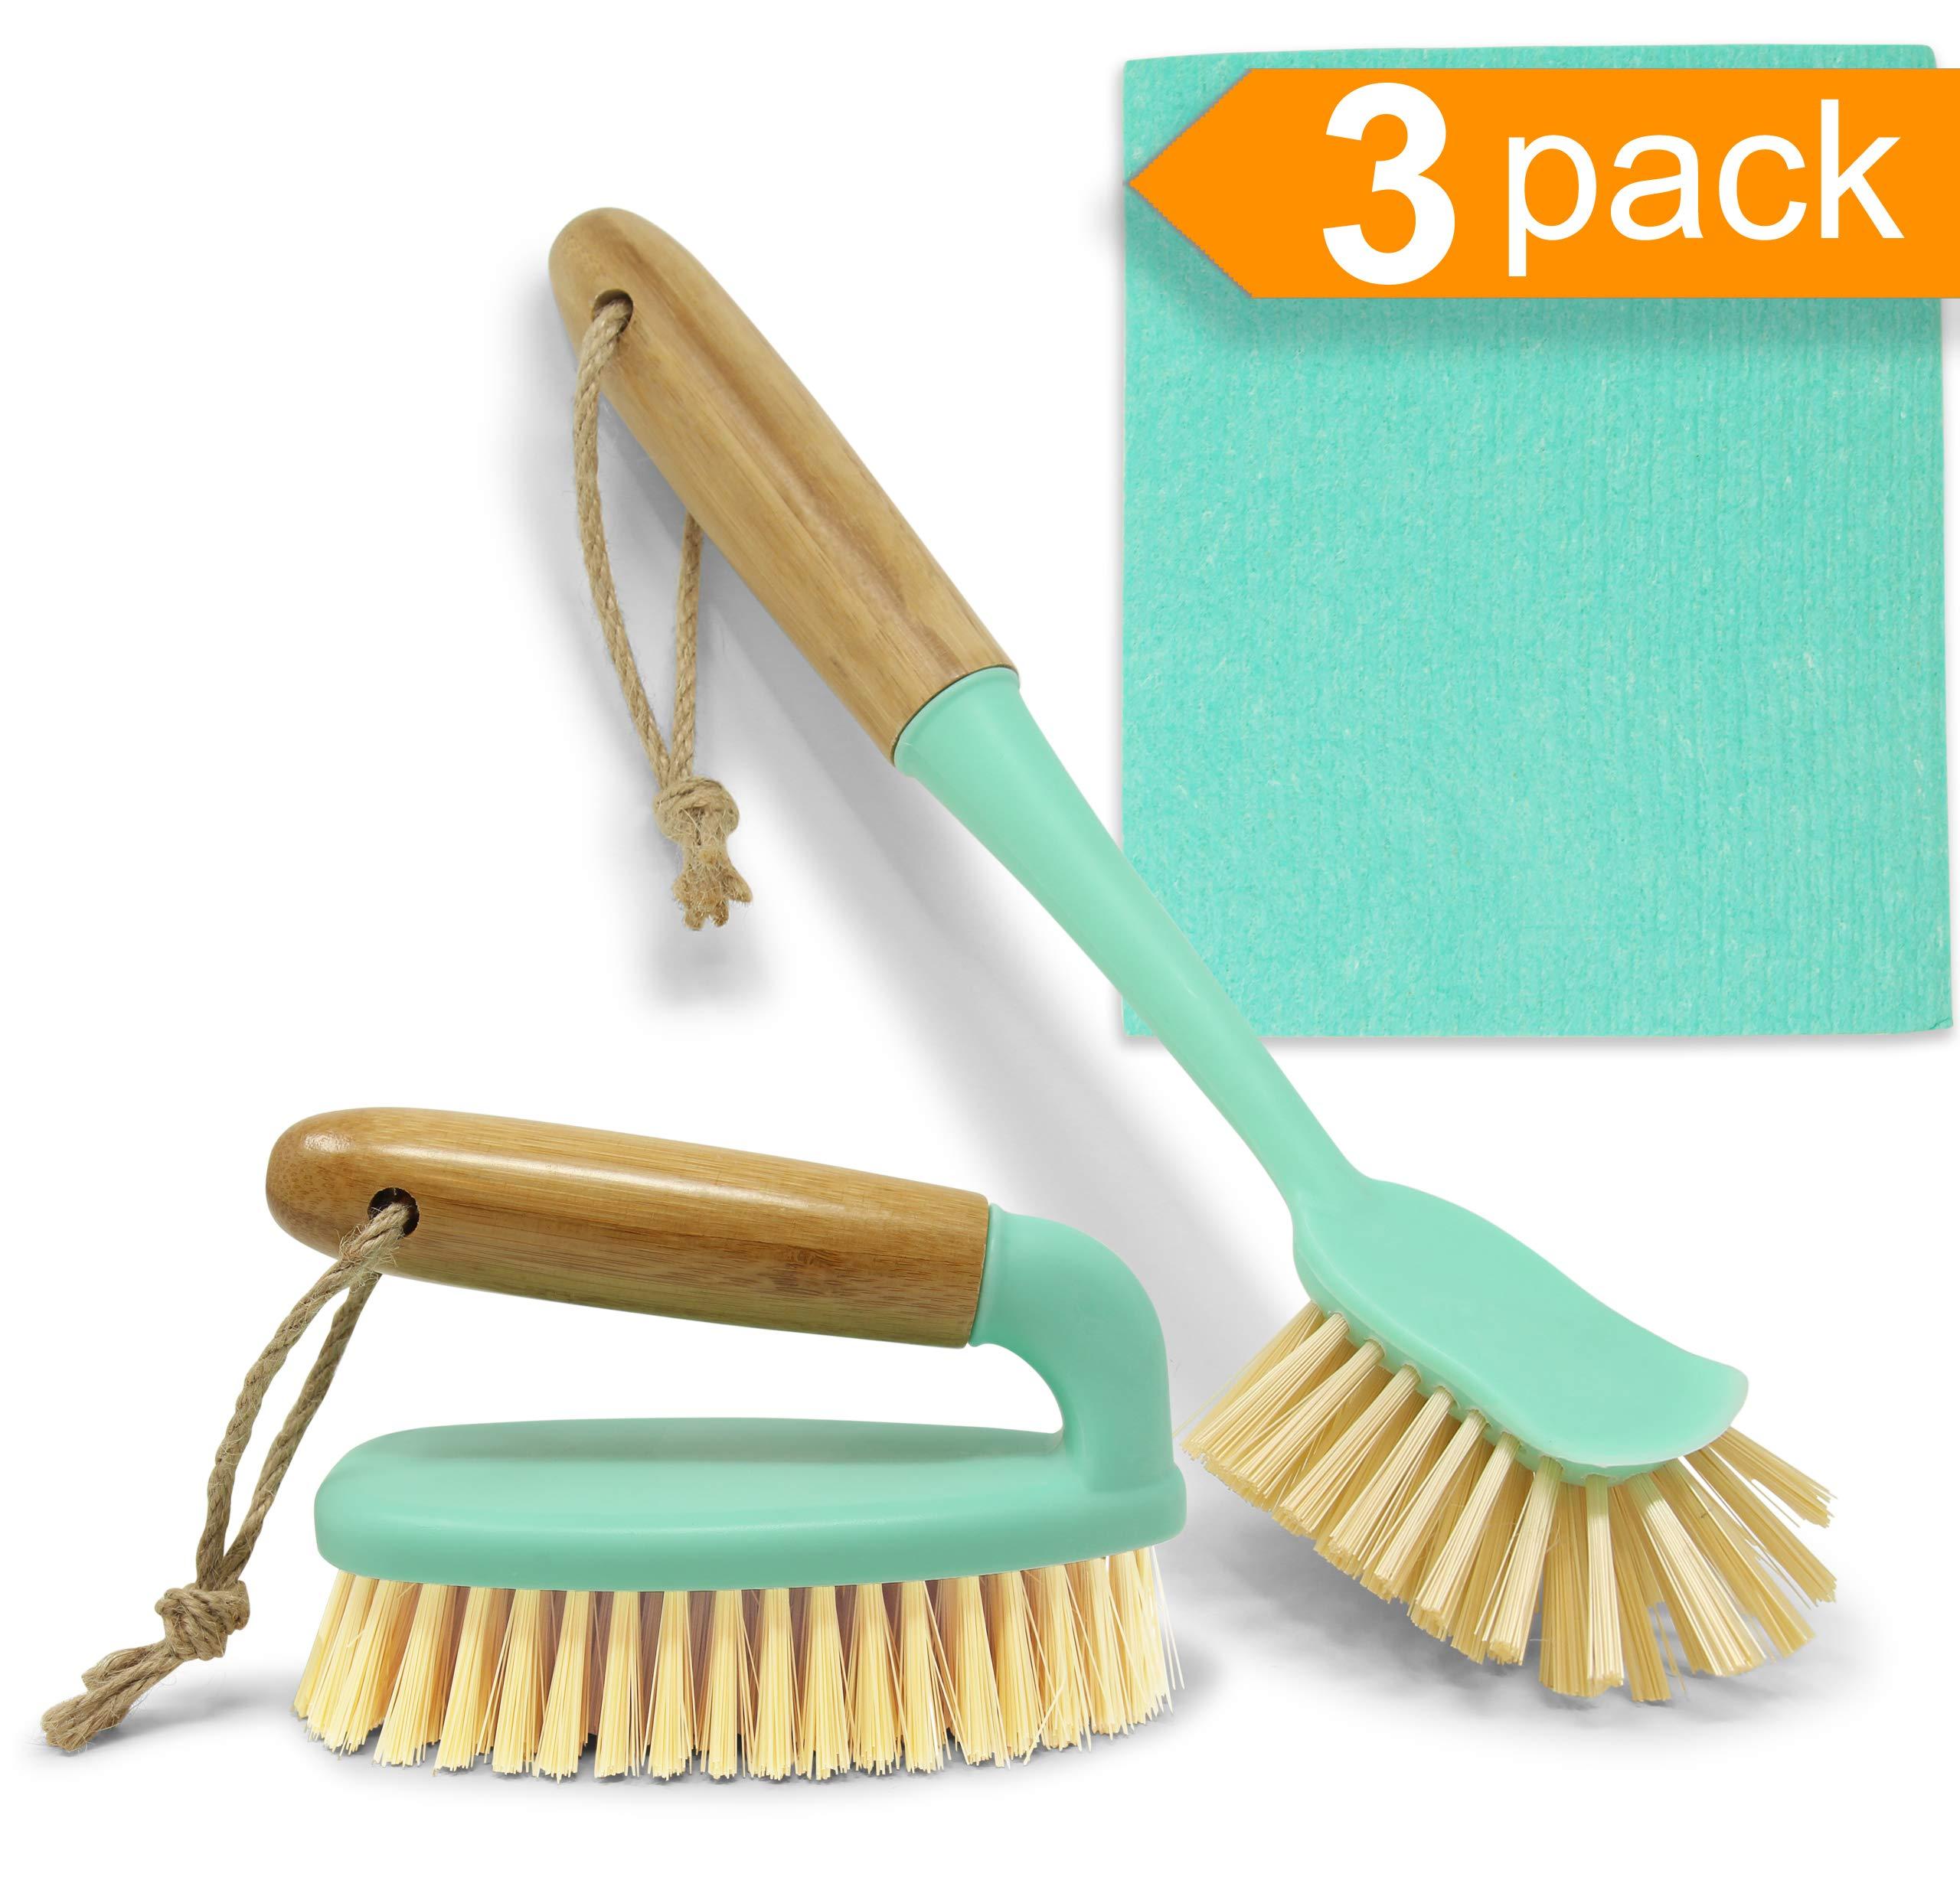 Bamboo Handle Scrub Brush Set